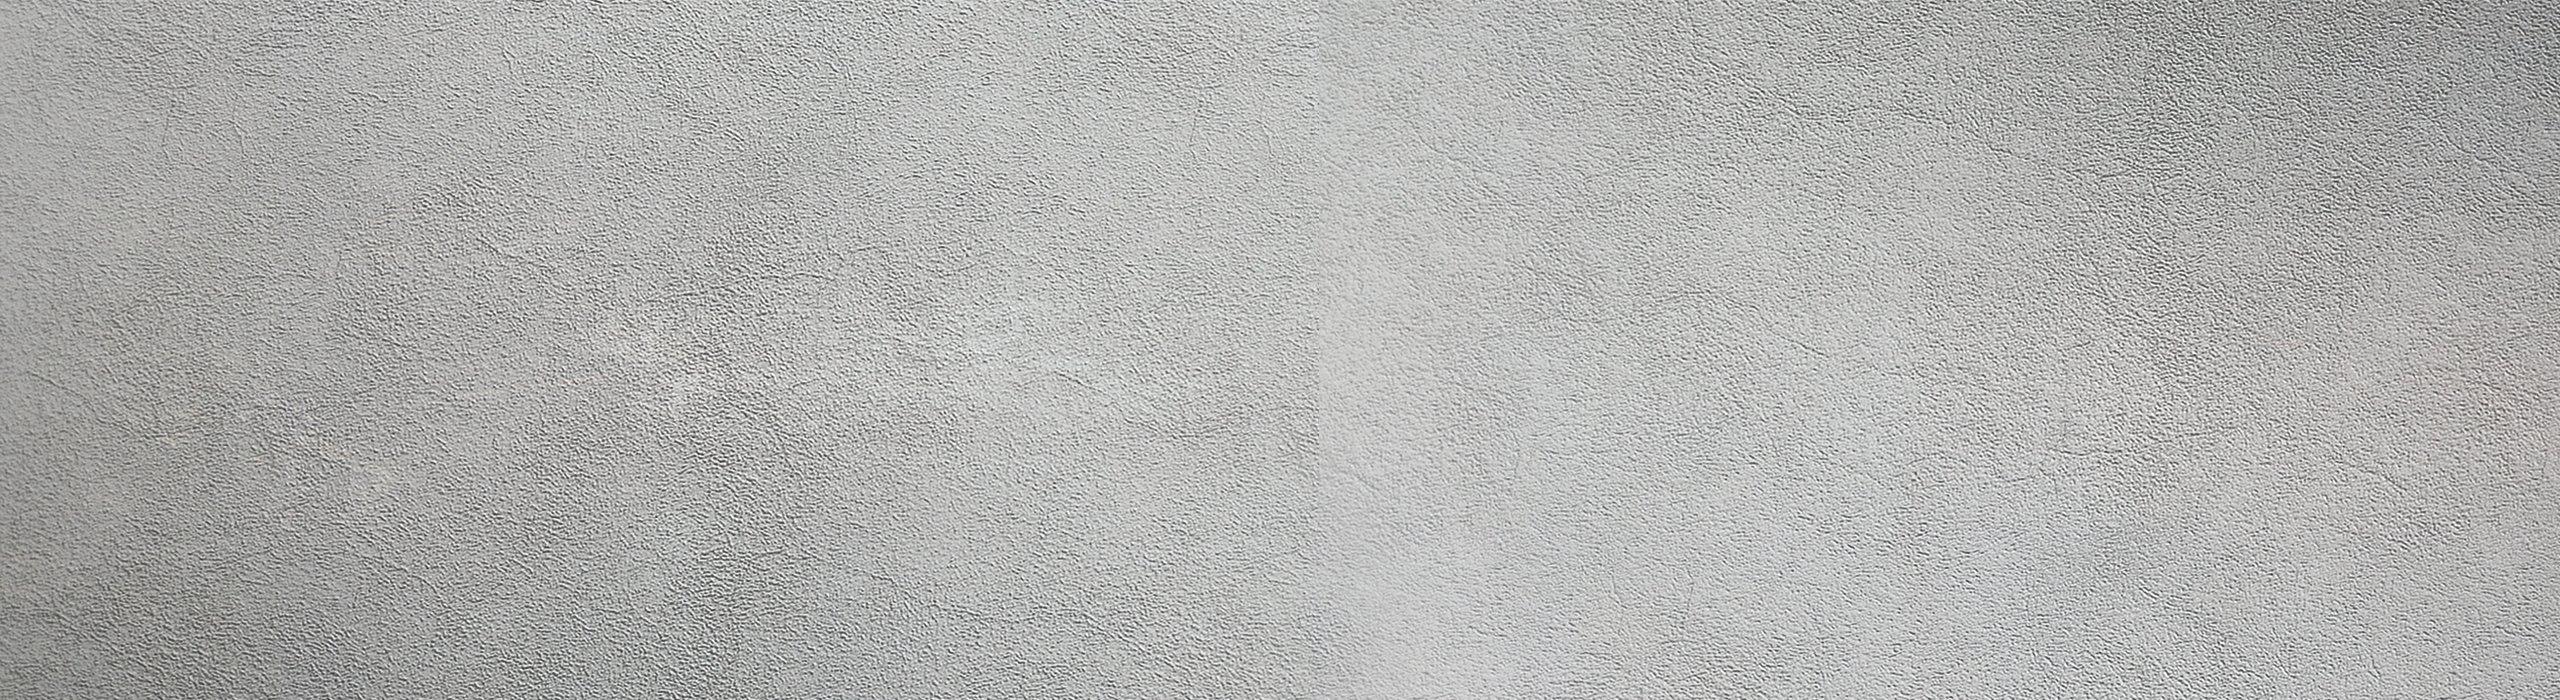 slide-front-texture